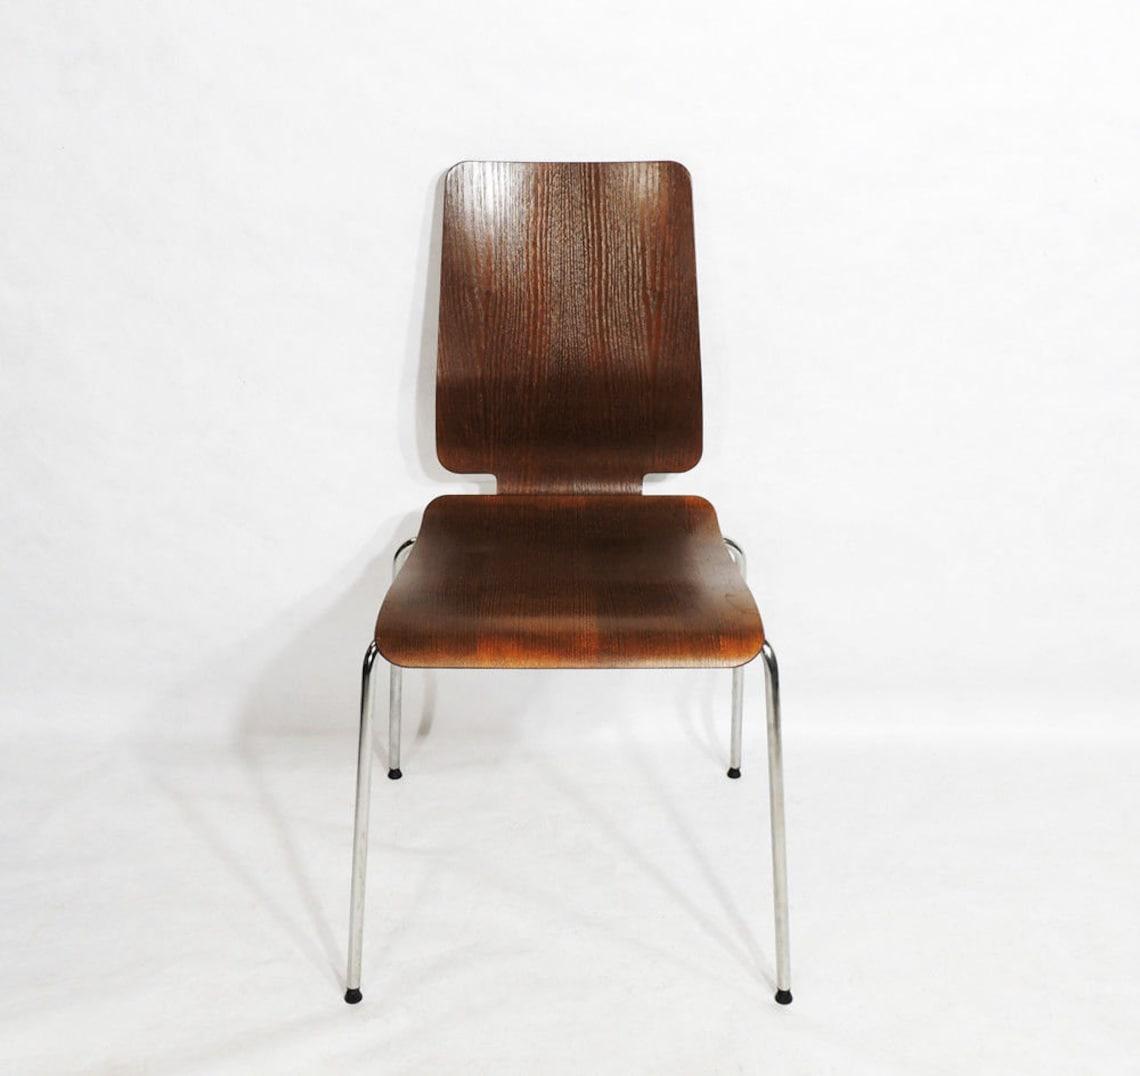 Vintage Modernist Plywood Seat Metal Frame Chair